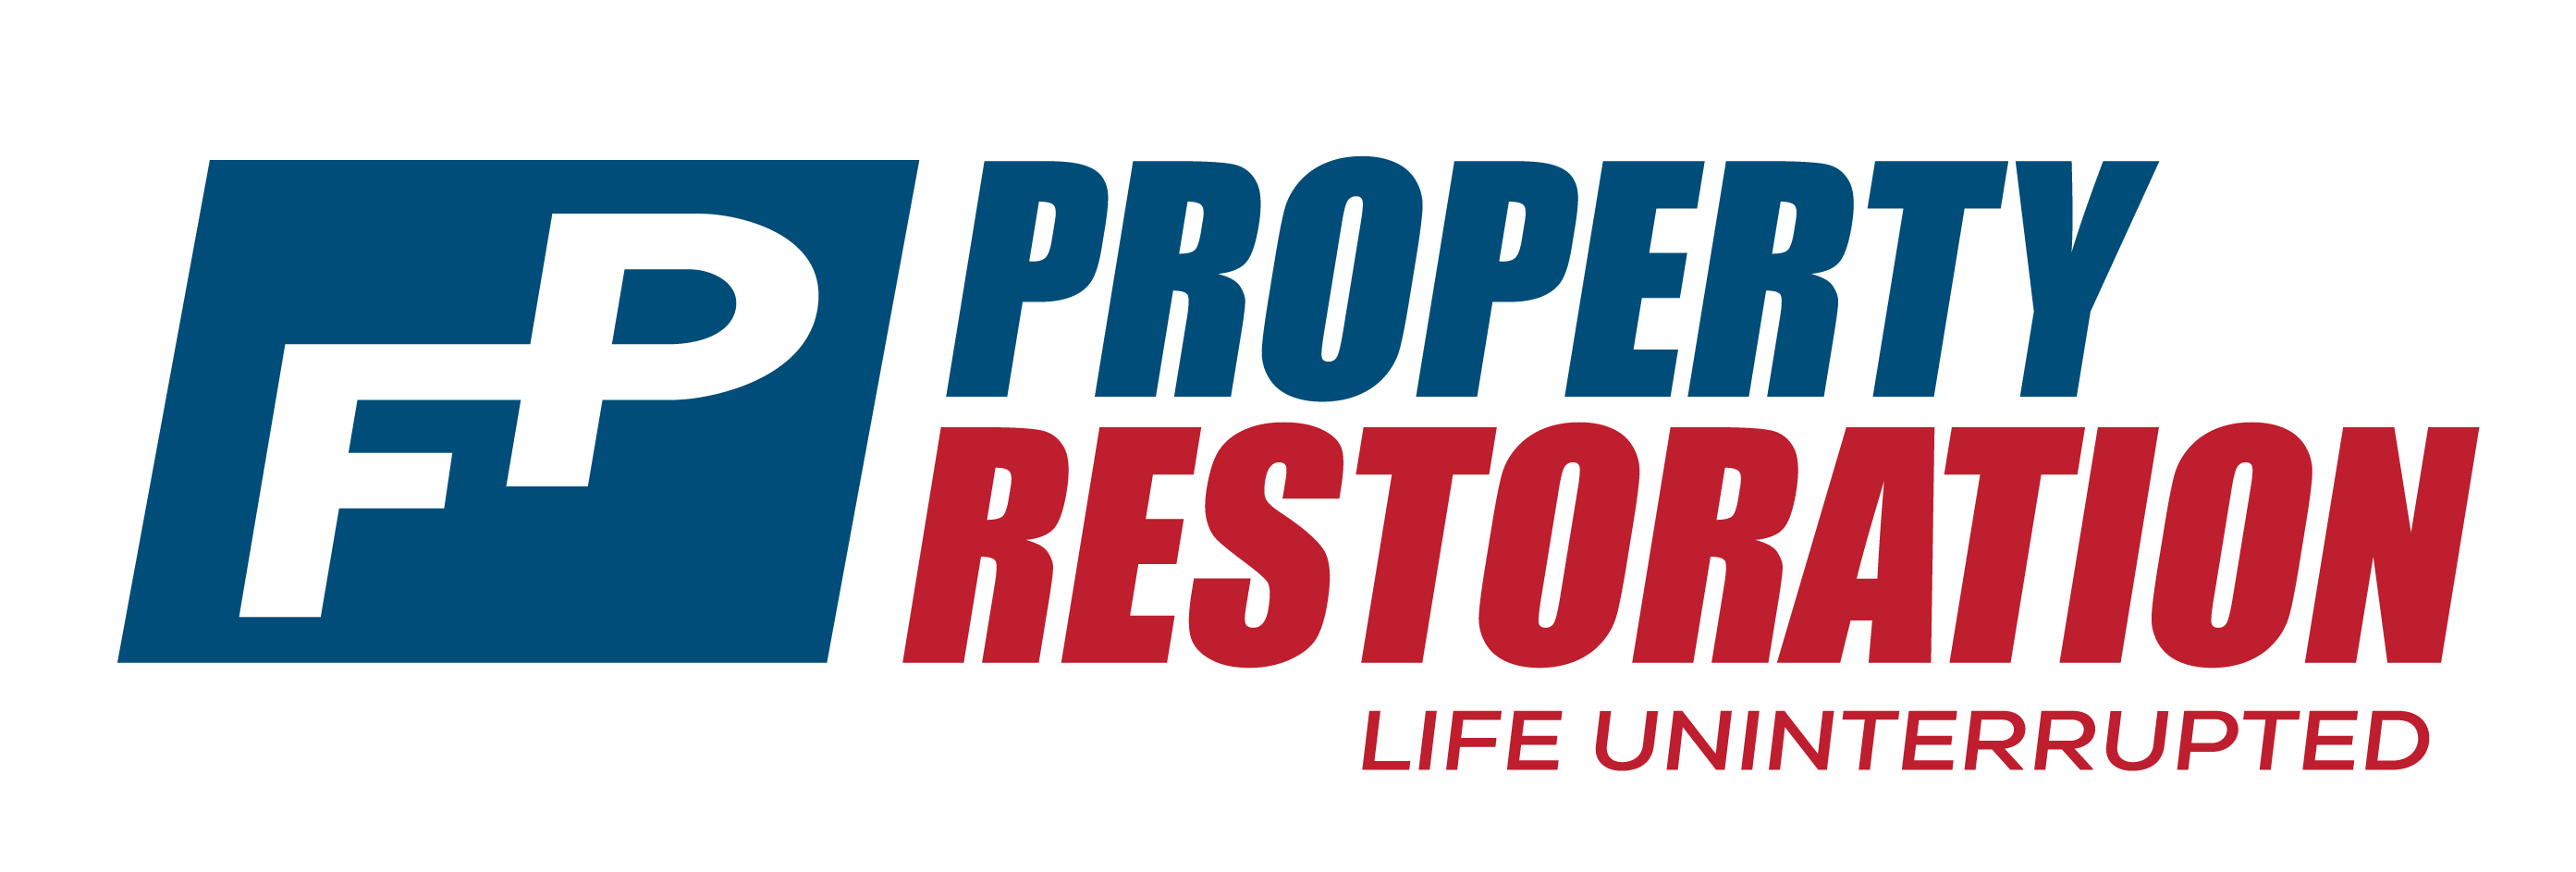 FP Property Restoration - 559